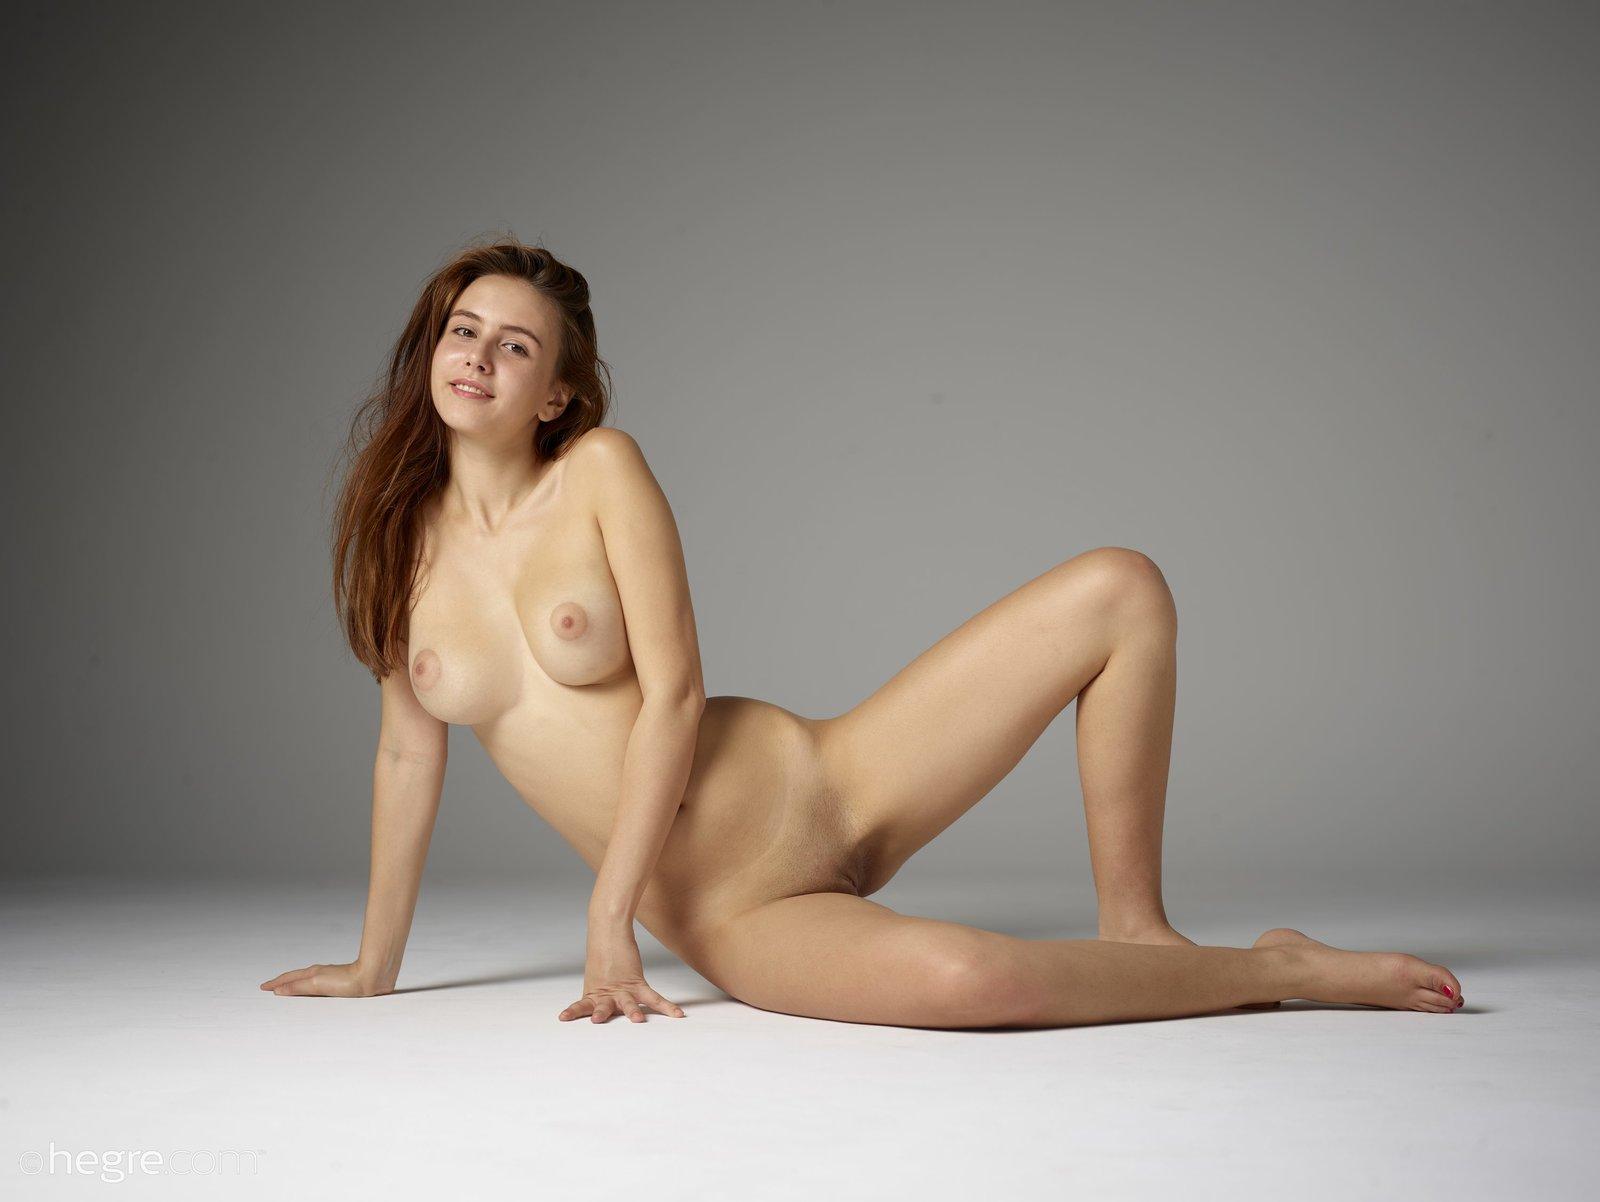 Full figure women nude pics